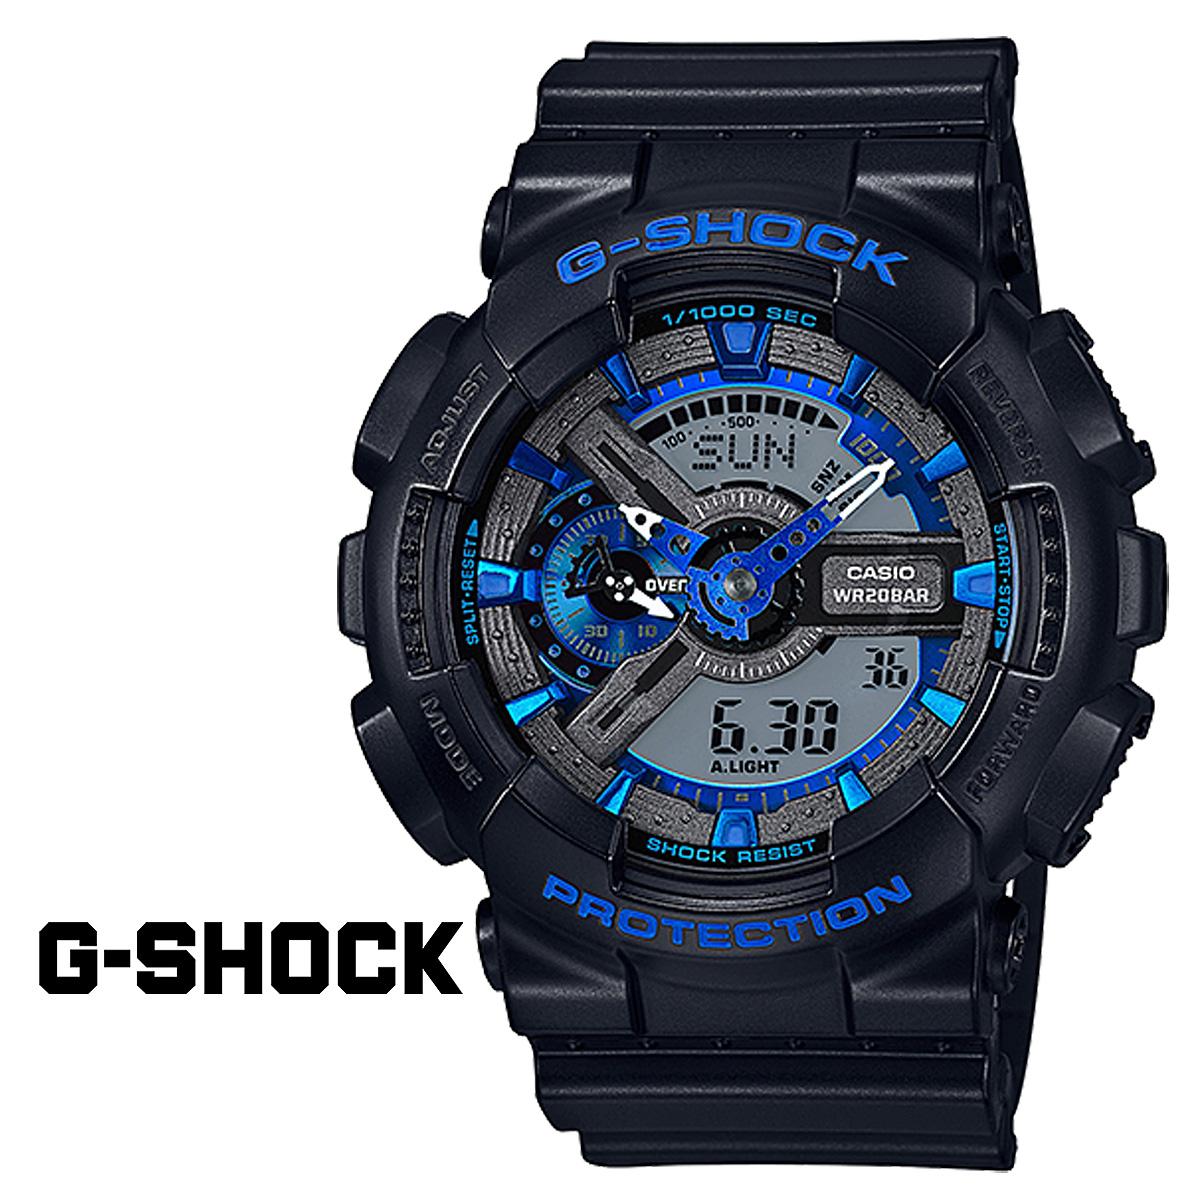 casio g shock tide watch manual